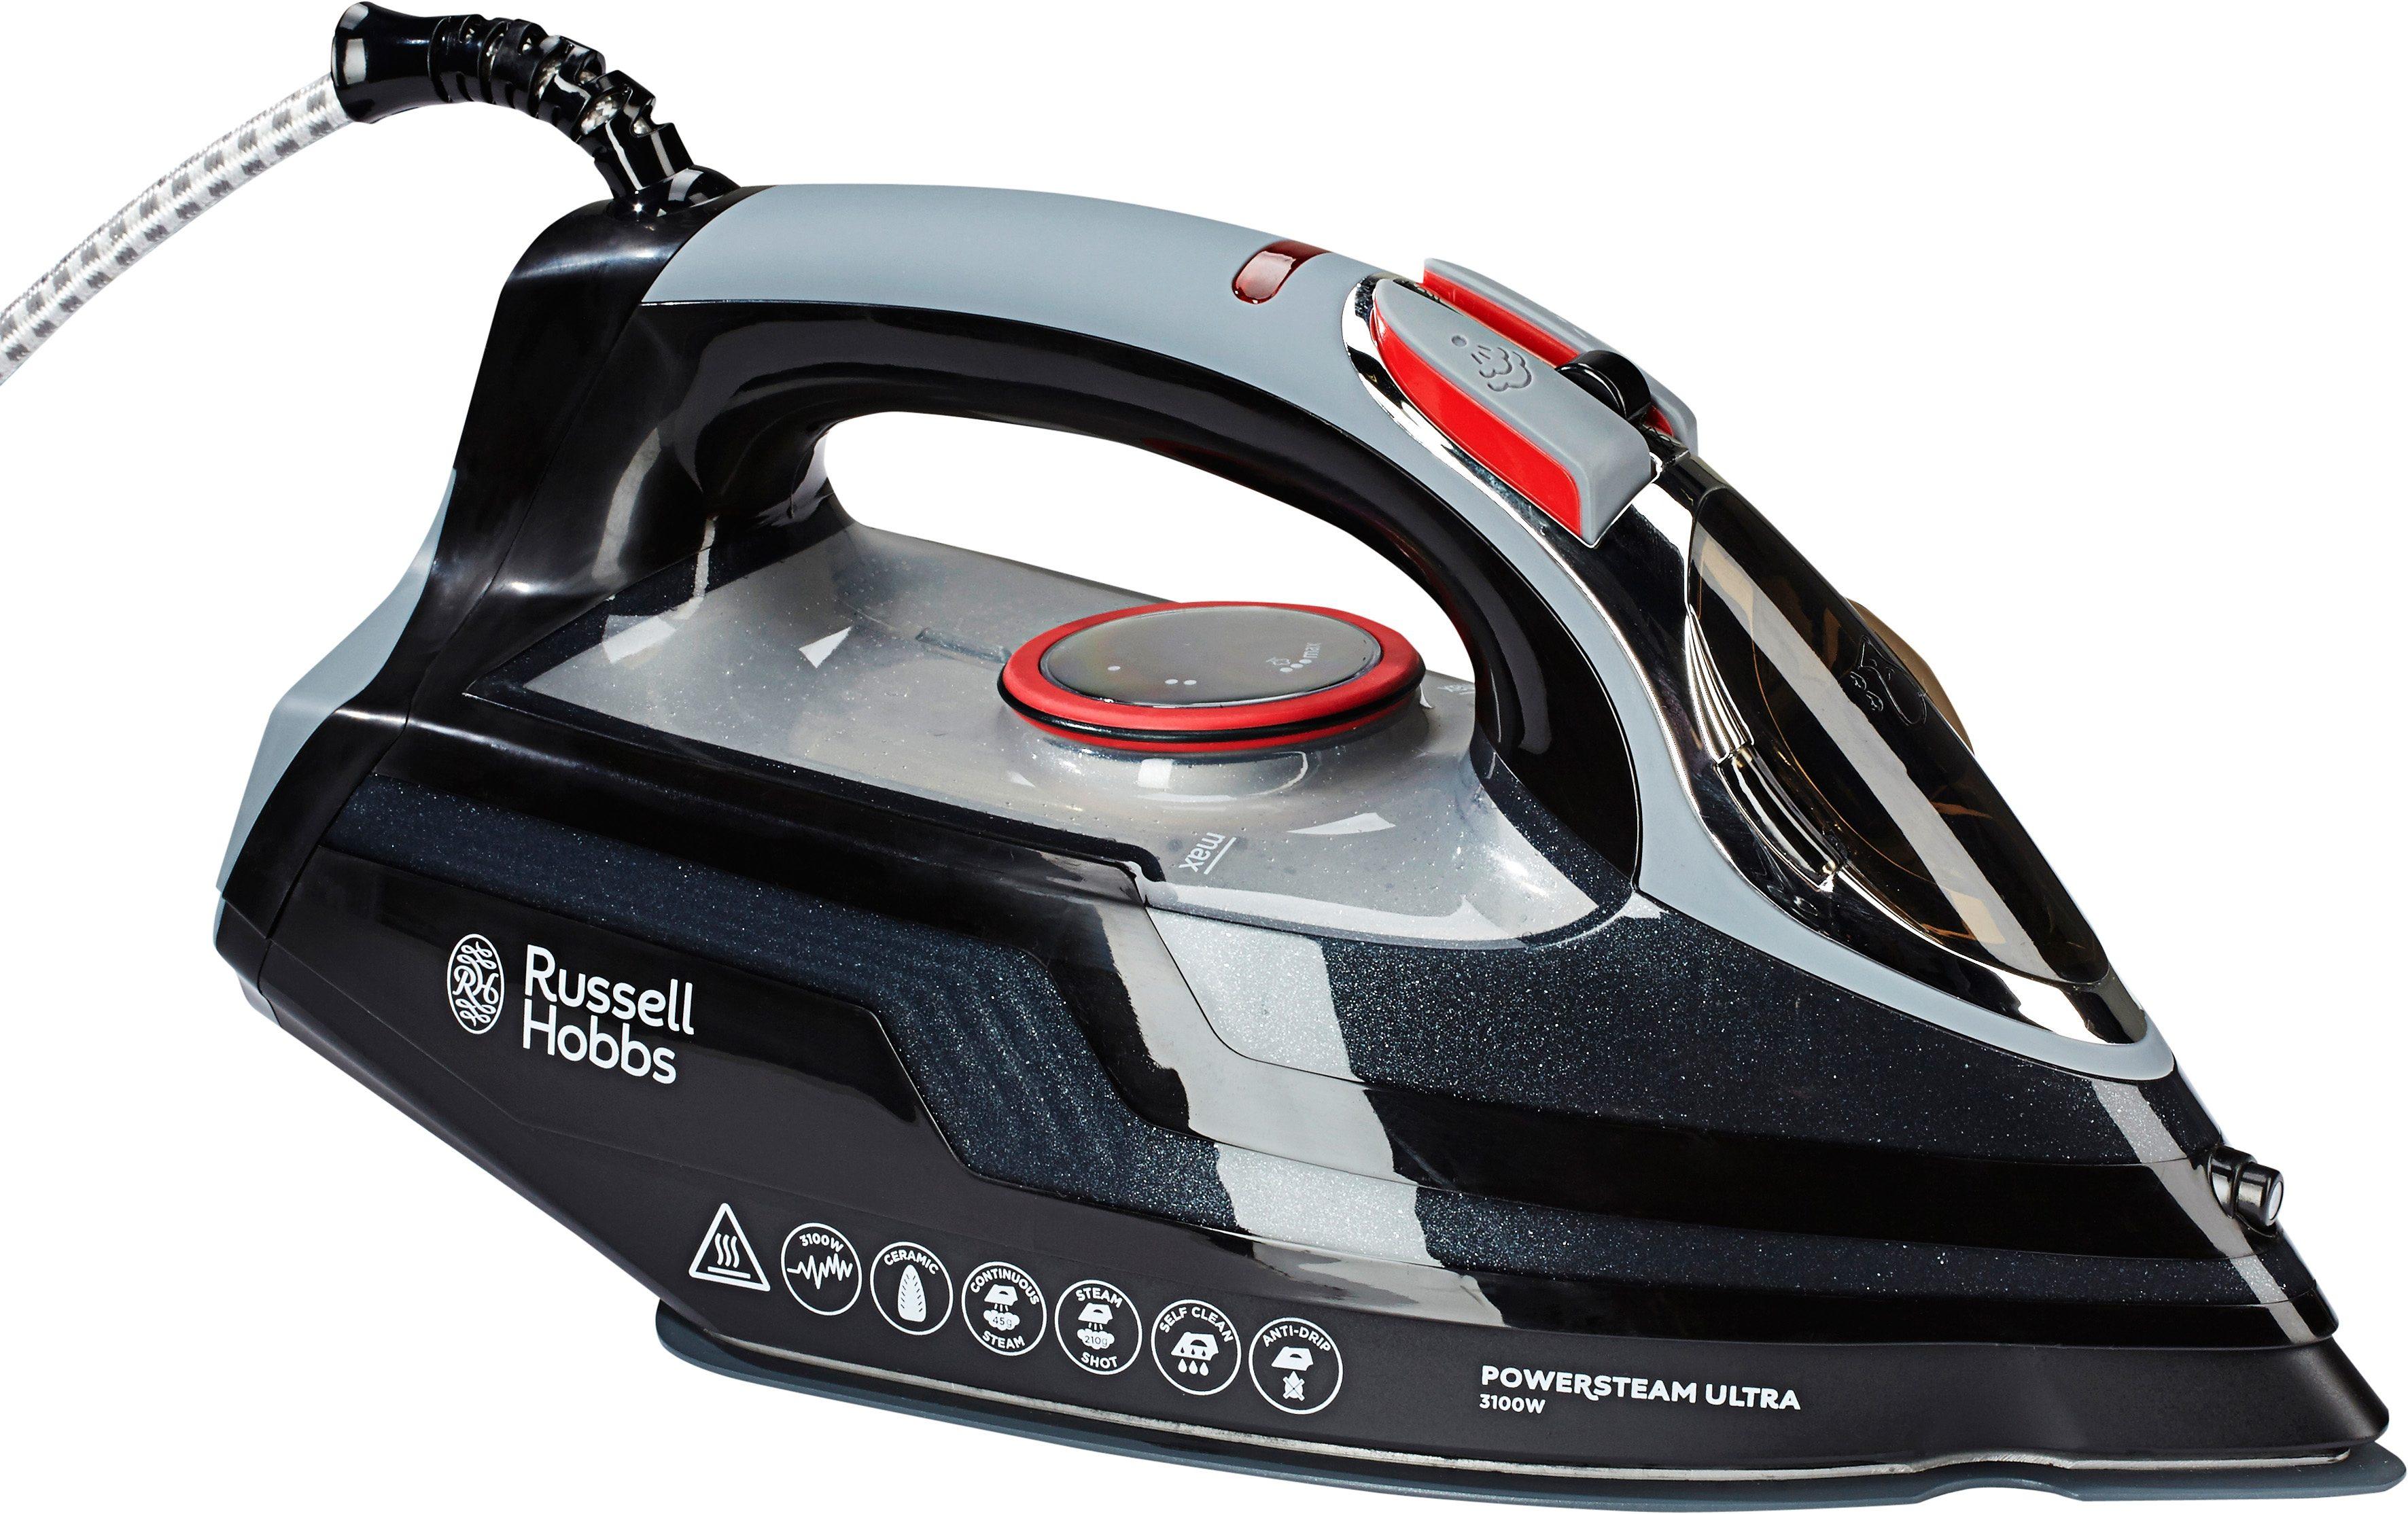 RUSSELL HOBBS Dampfbügeleisen »Power Steam Ultra« 20630-56, 3100 Watt | Flur & Diele > Haushaltsgeräte > Bügeleisen | Schwarz | Keramik | RUSSELL HOBBS